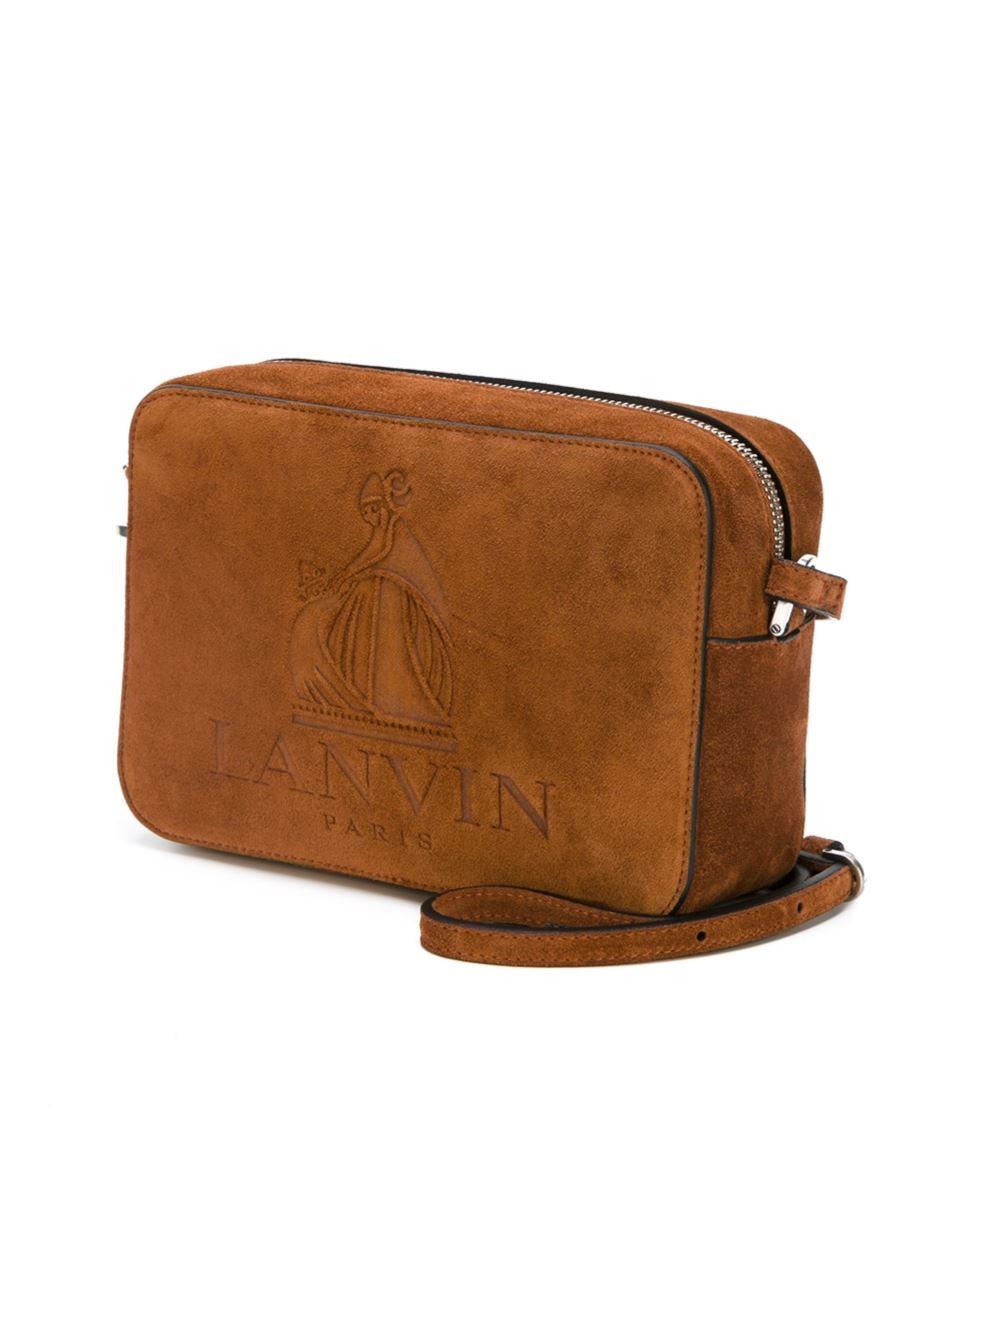 Lanvin Nomad Suede Camera Bag in Brown